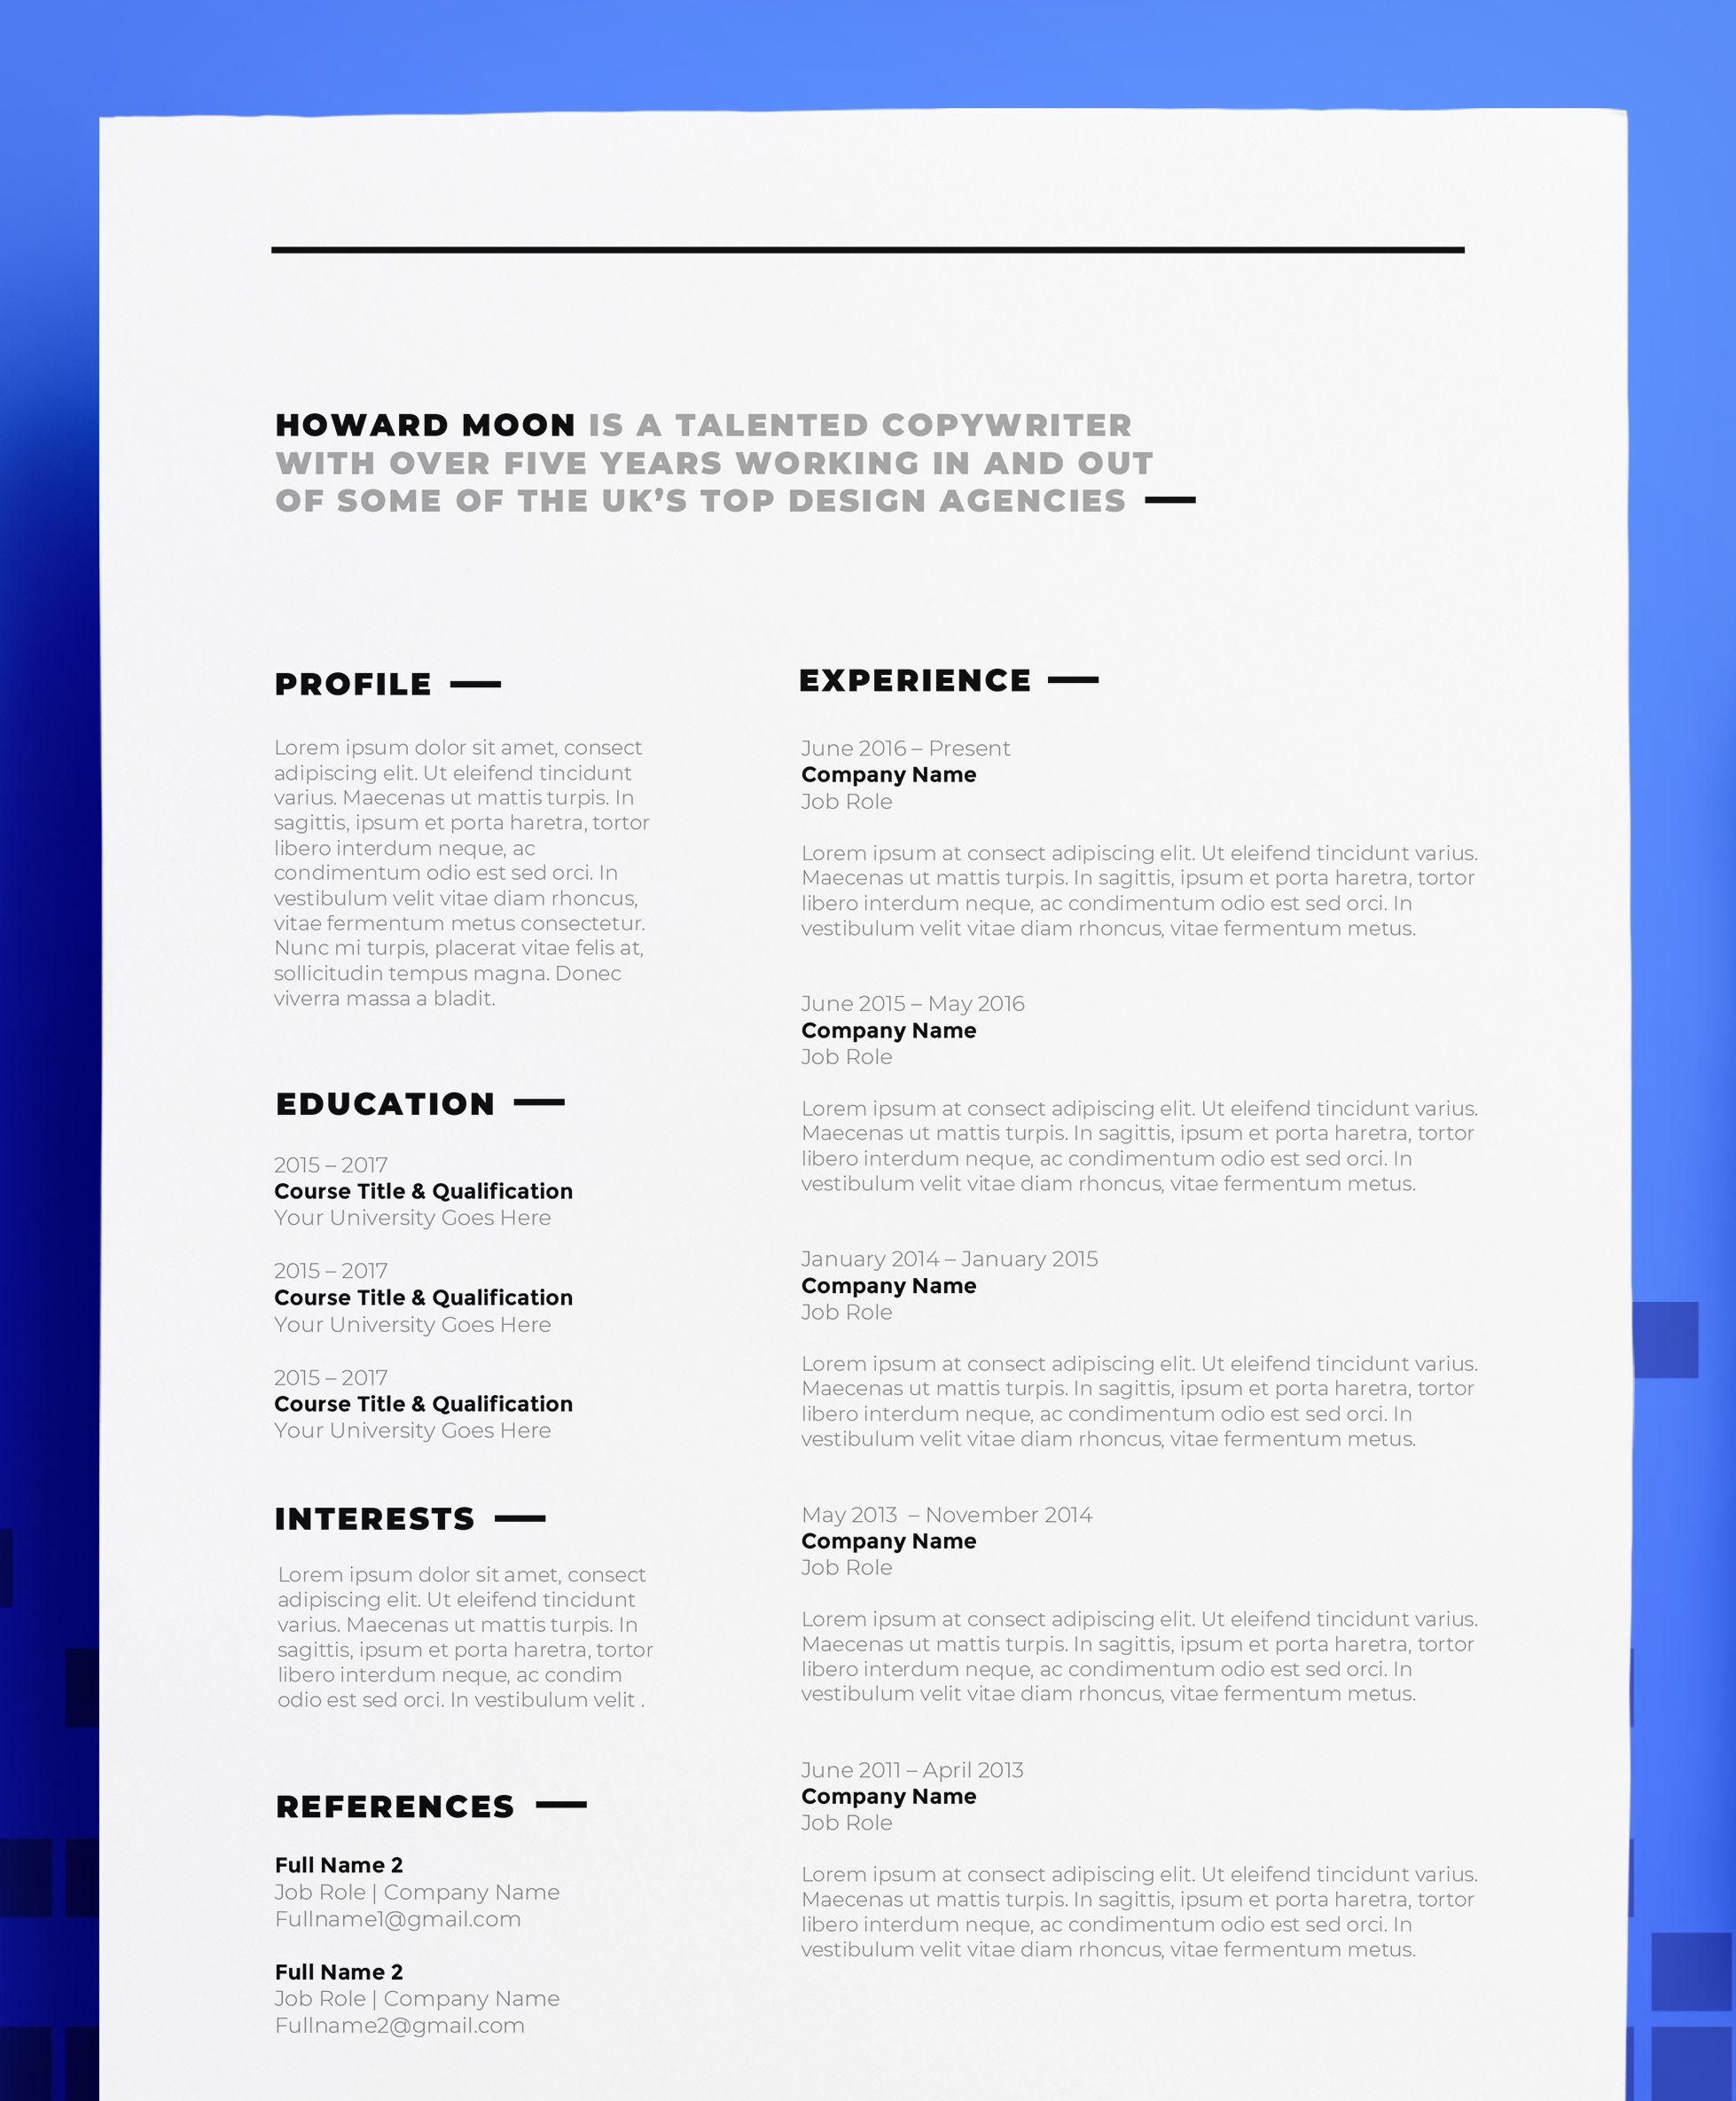 Copywriter Cv Resume Design Howard Moon Professional Etsy Cv Words Cv Design Template Resume Design Template